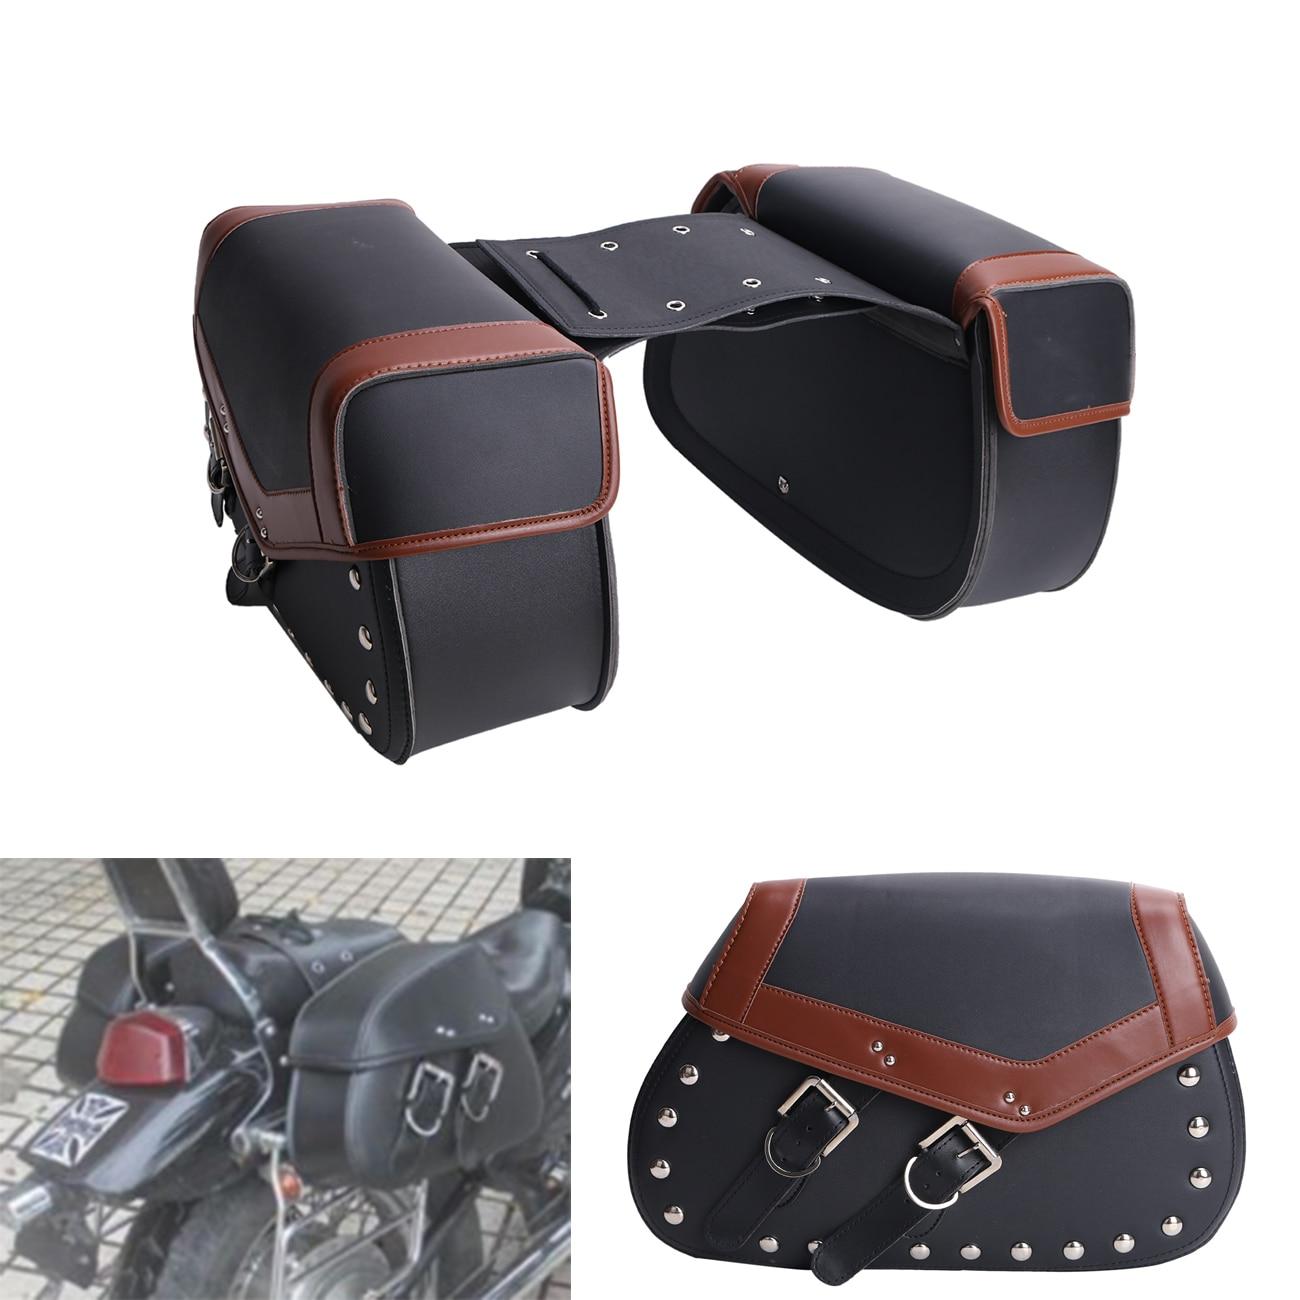 2х старинные заклепки мотоцикл сумки багажа для Harley седло мешок сума для Ямаха Хонда Сузуки Кавасаки мотоцикл #MBH260